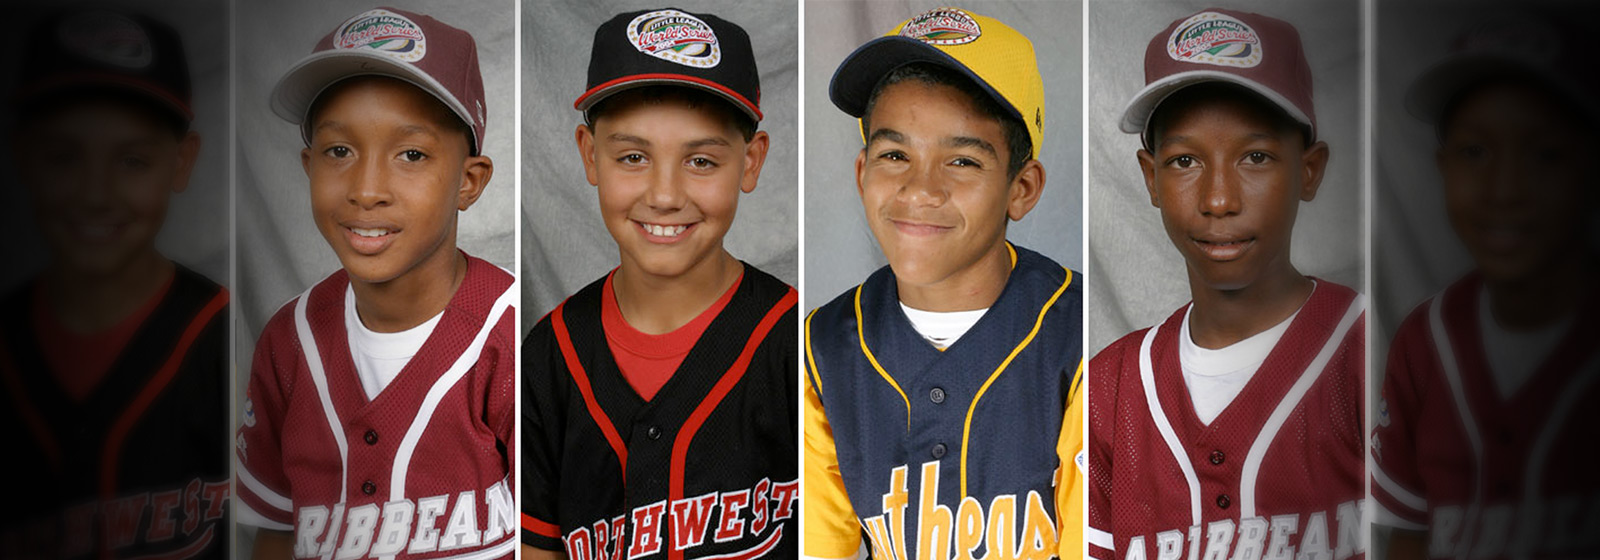 The 2016 MLB Postseason